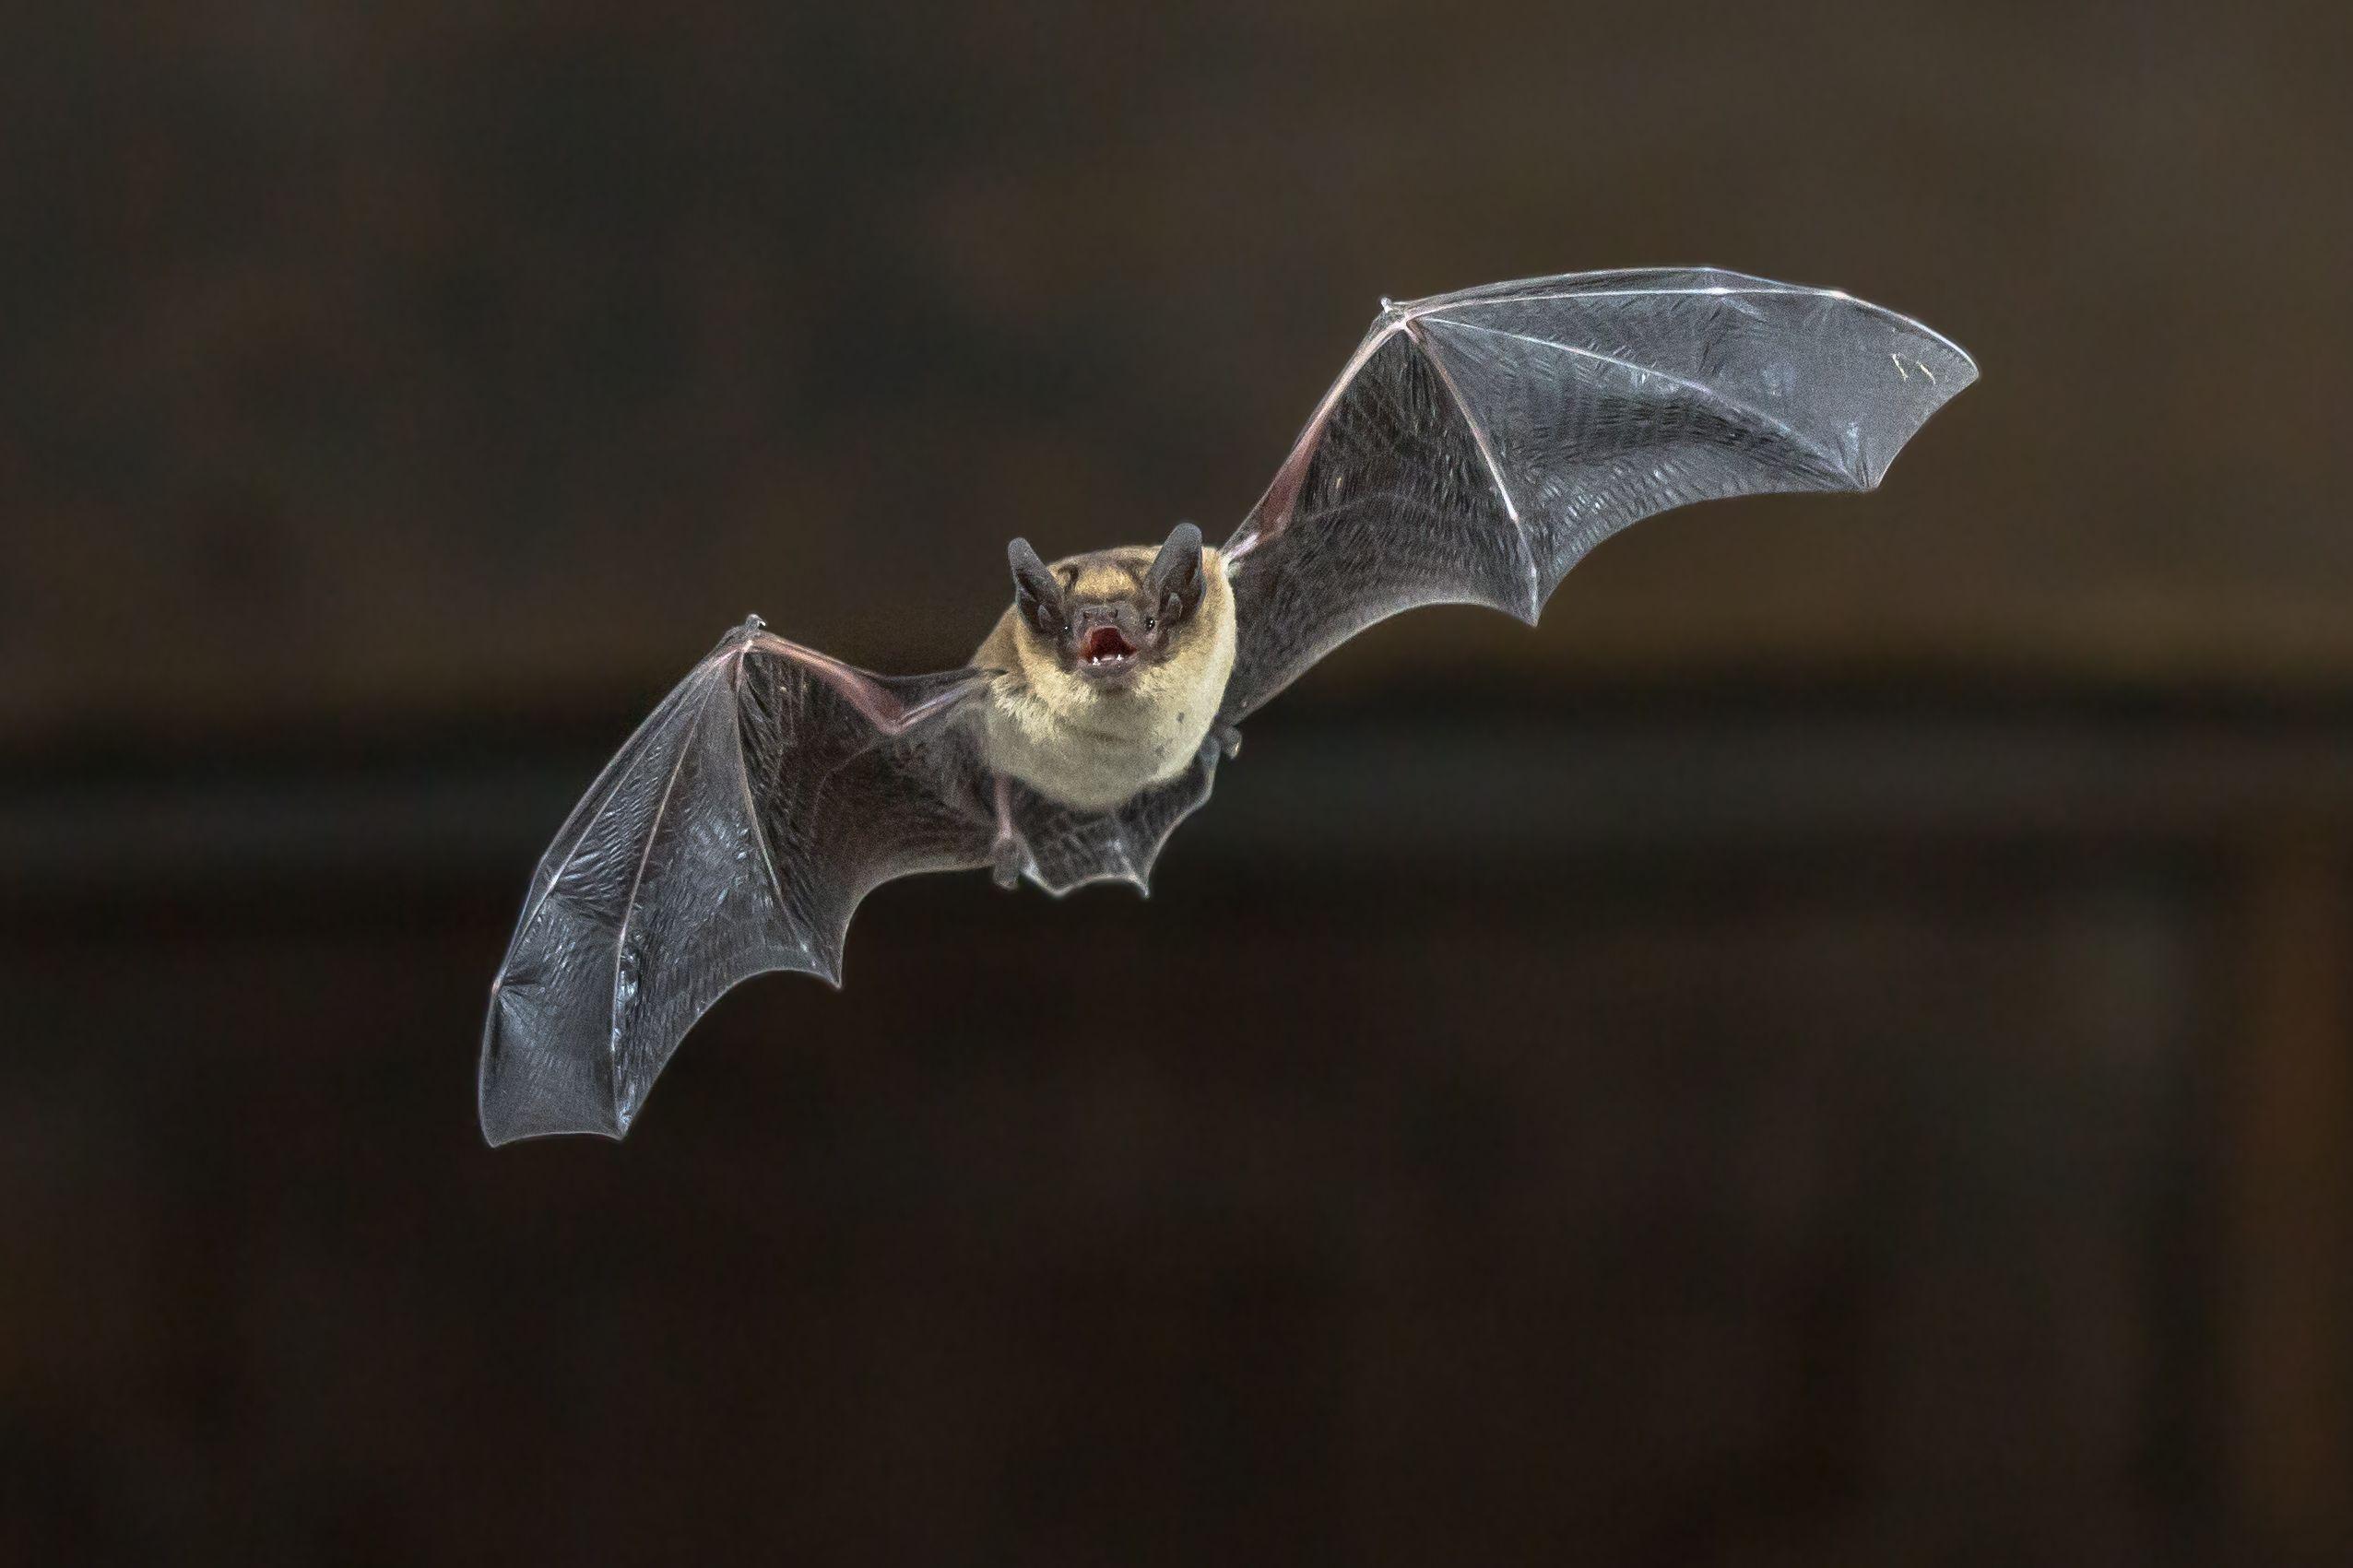 Bats have thumbs.